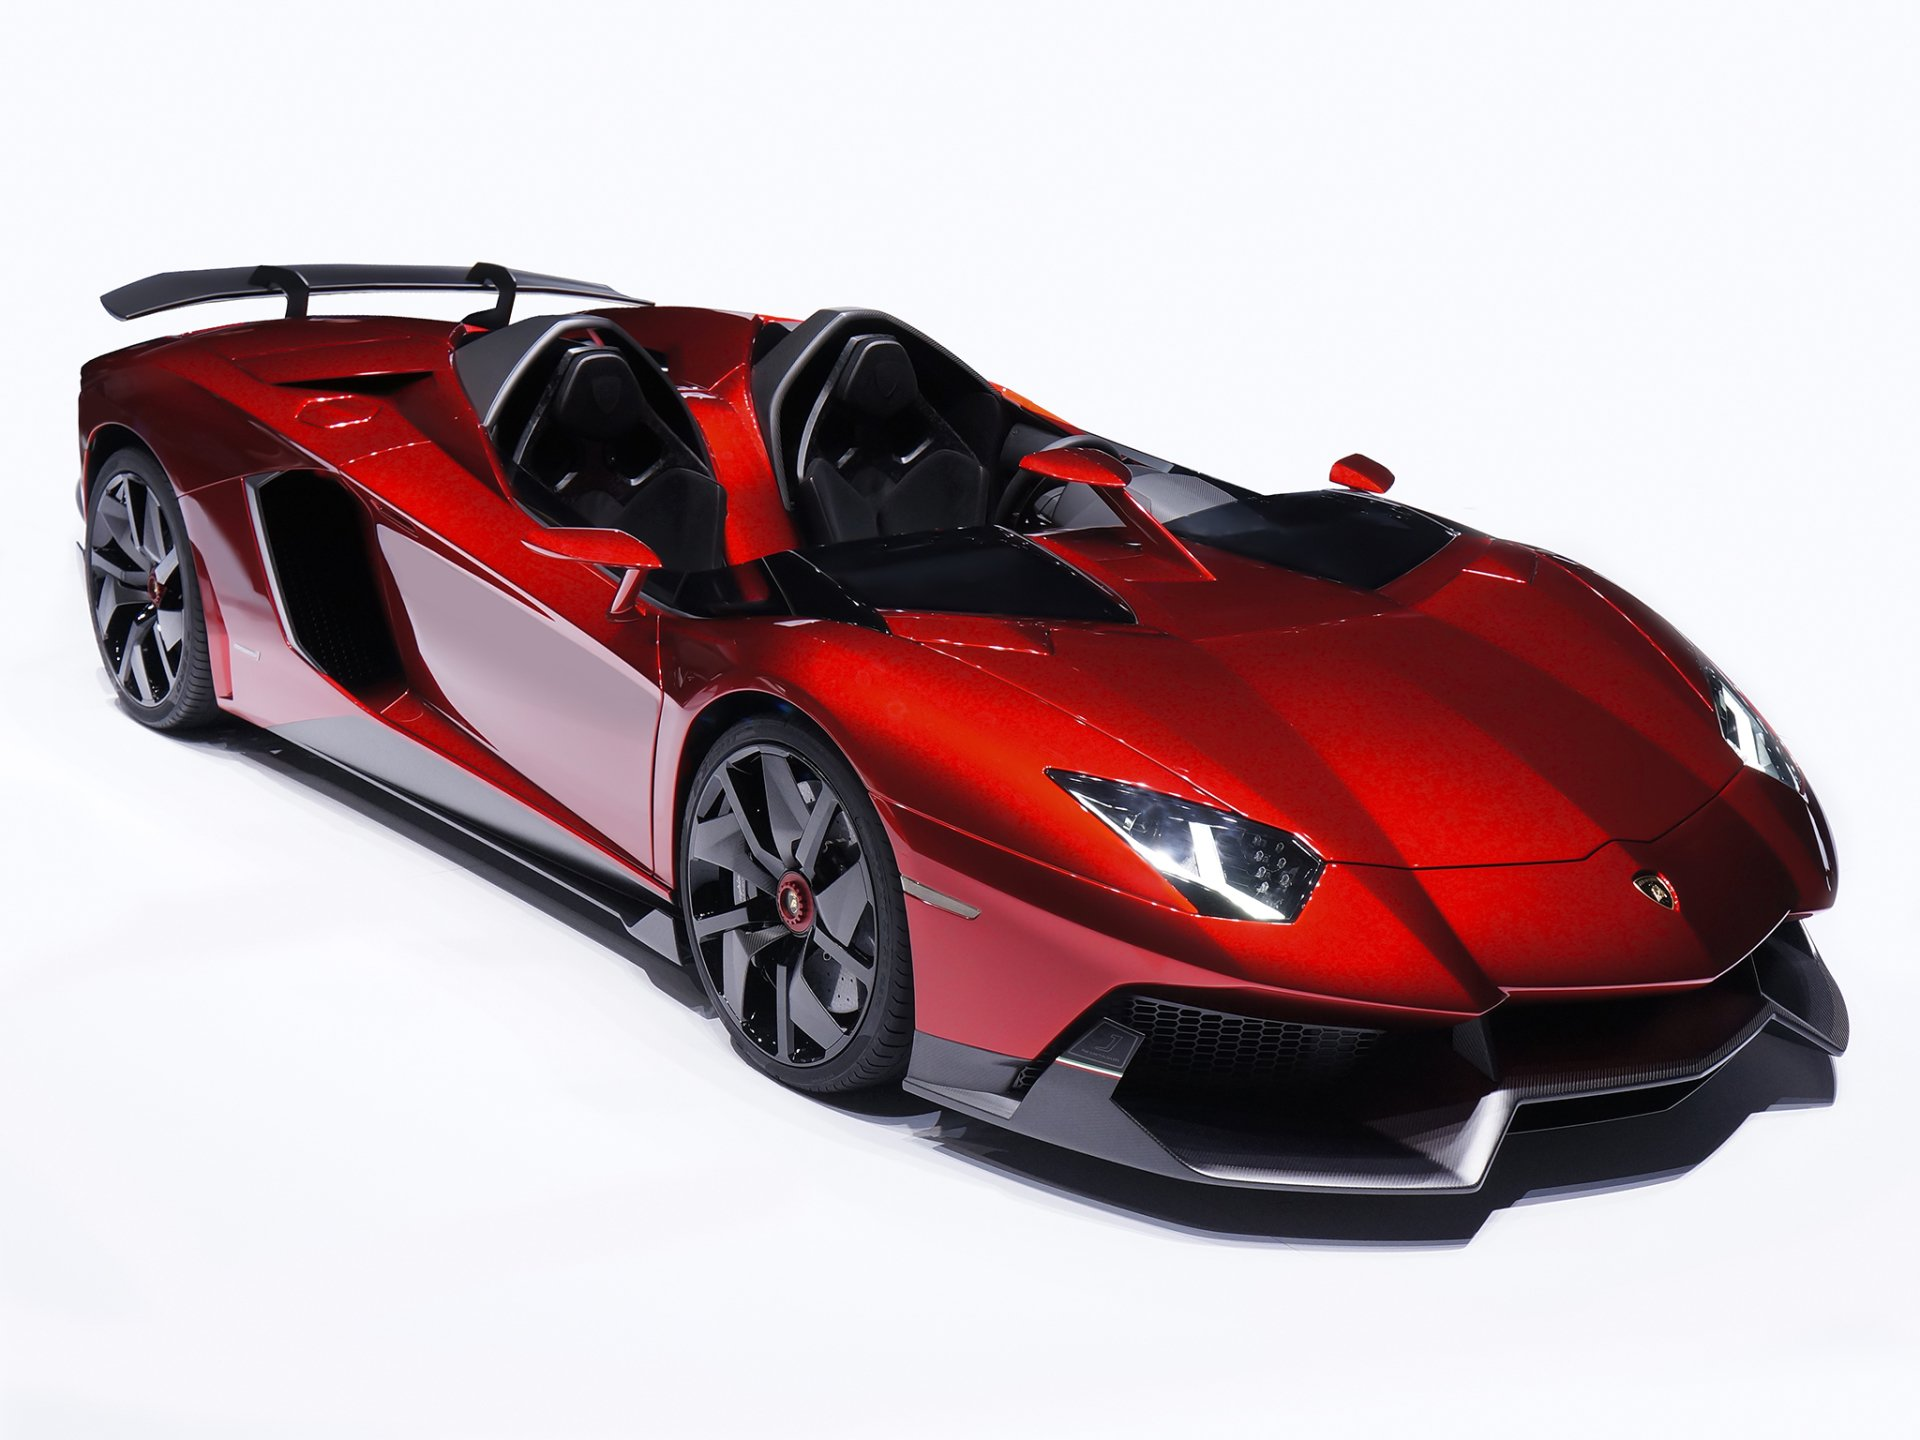 Lamborghini Aventador J HD Wallpaper | Background Image ...